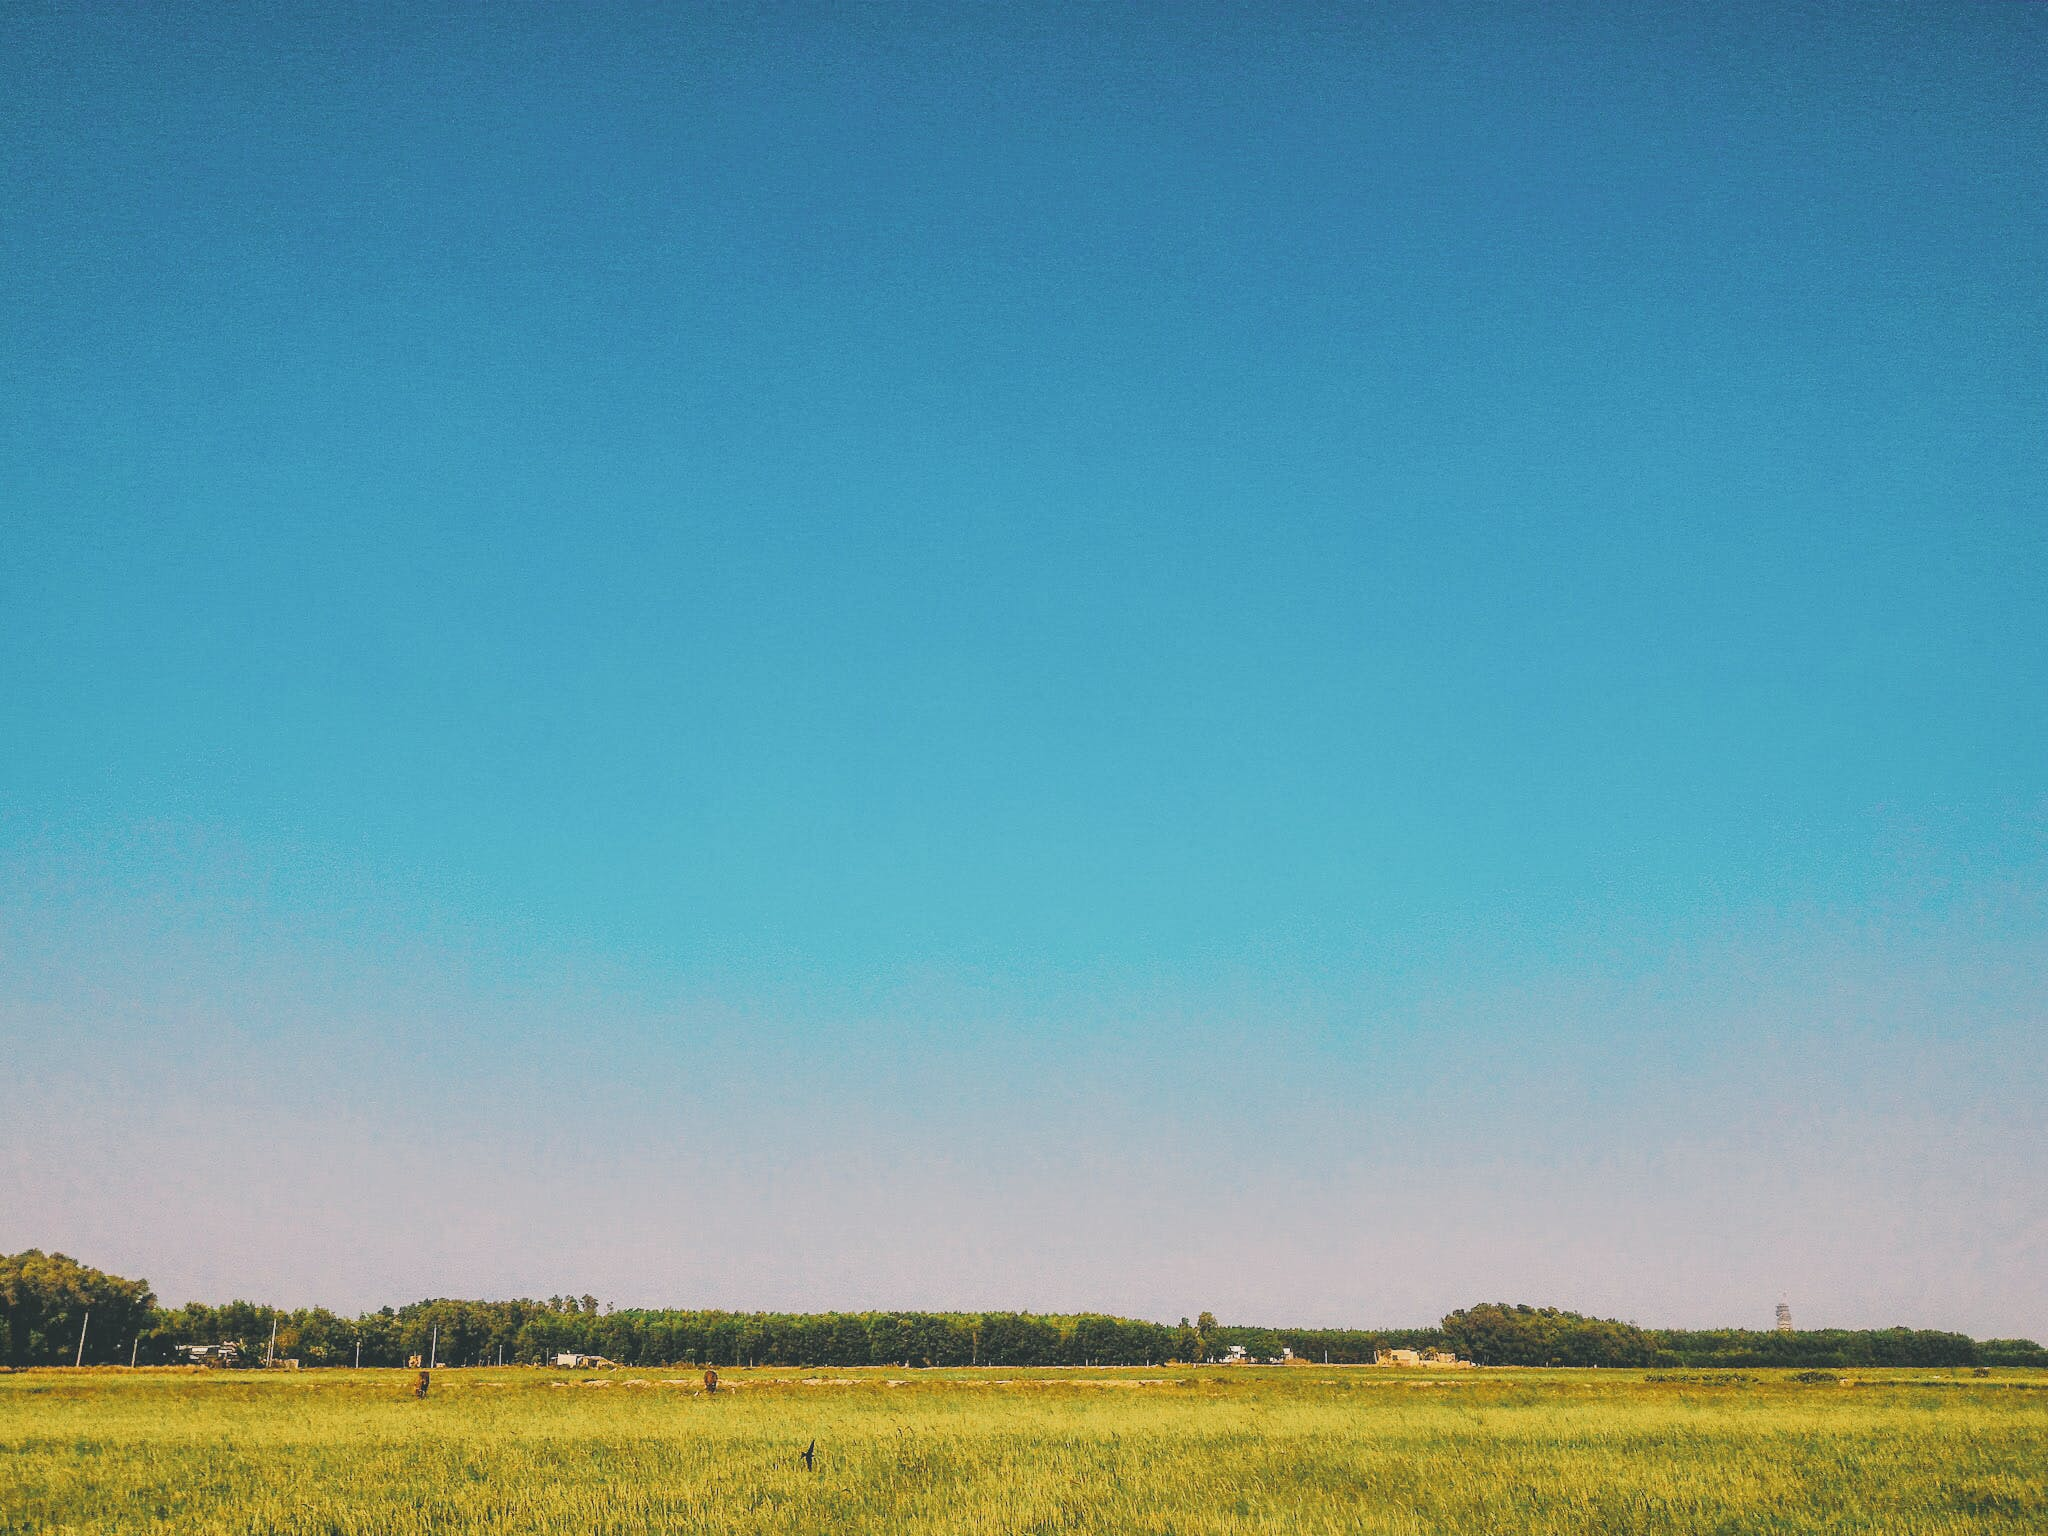 Grass Field Under Blue Sky at Daytime